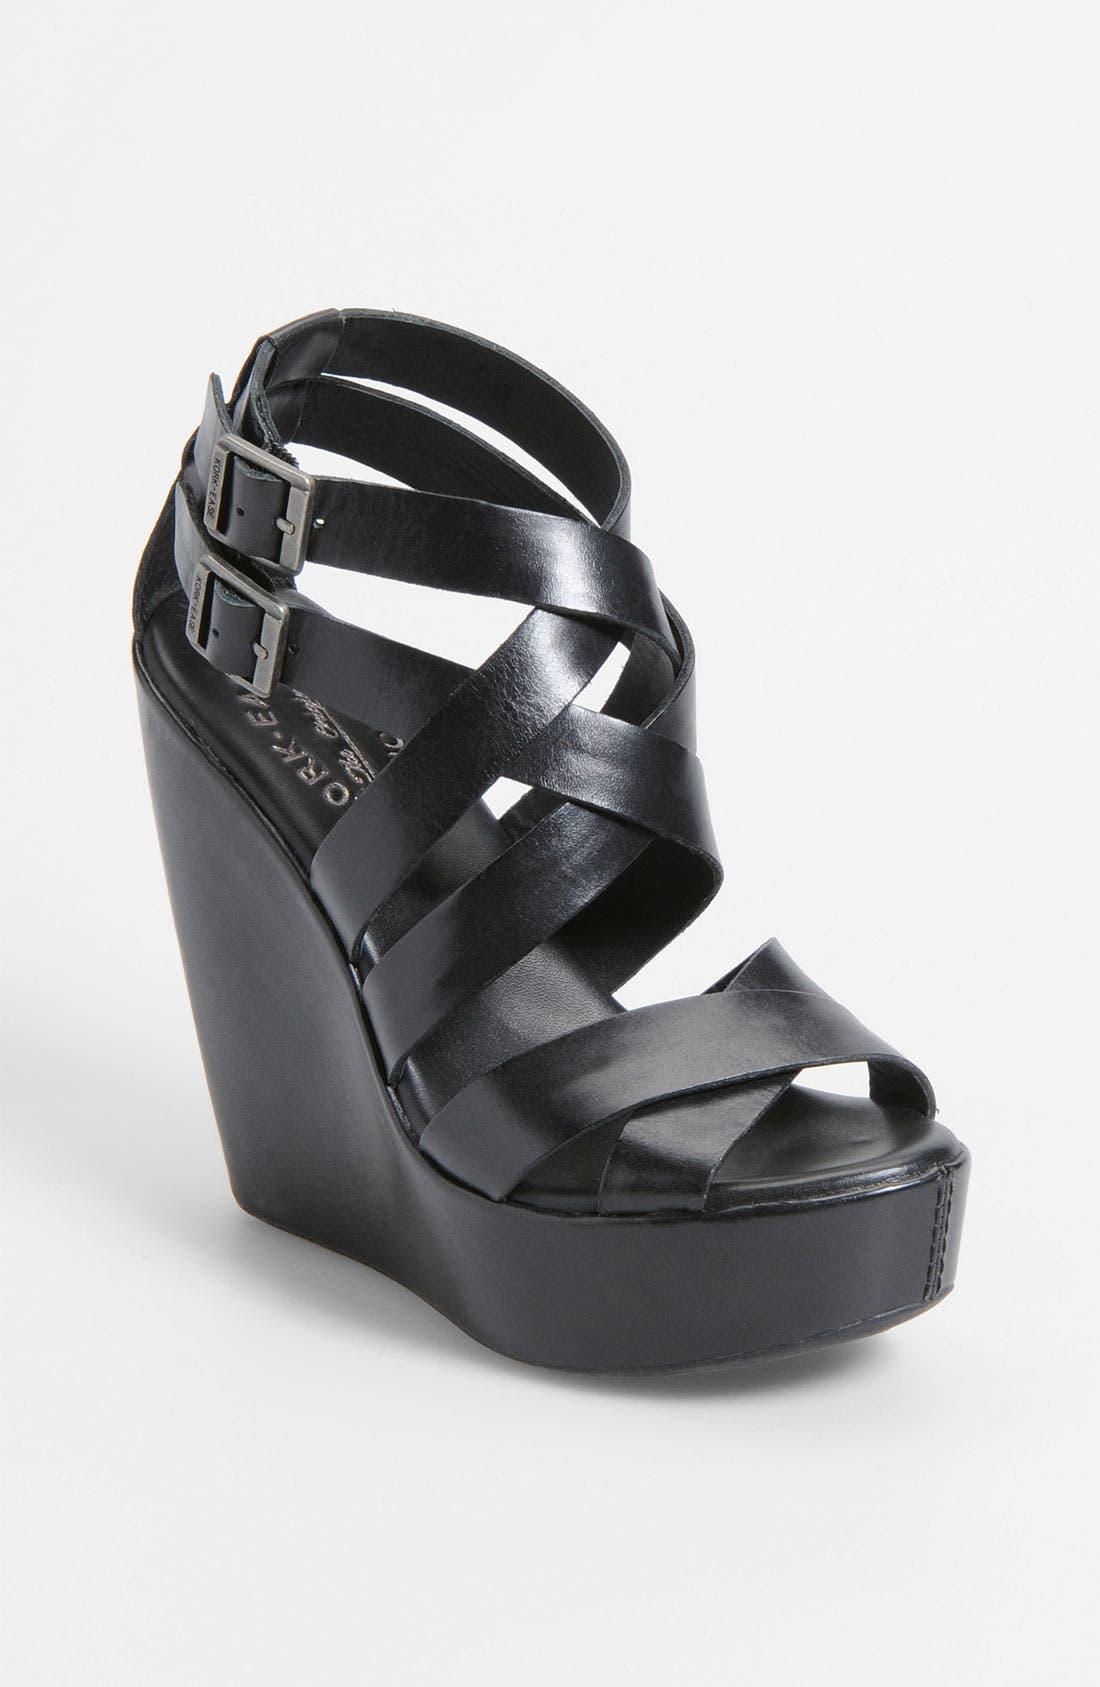 Main Image - Kork-Ease 'Hailey' Wedge Sandal